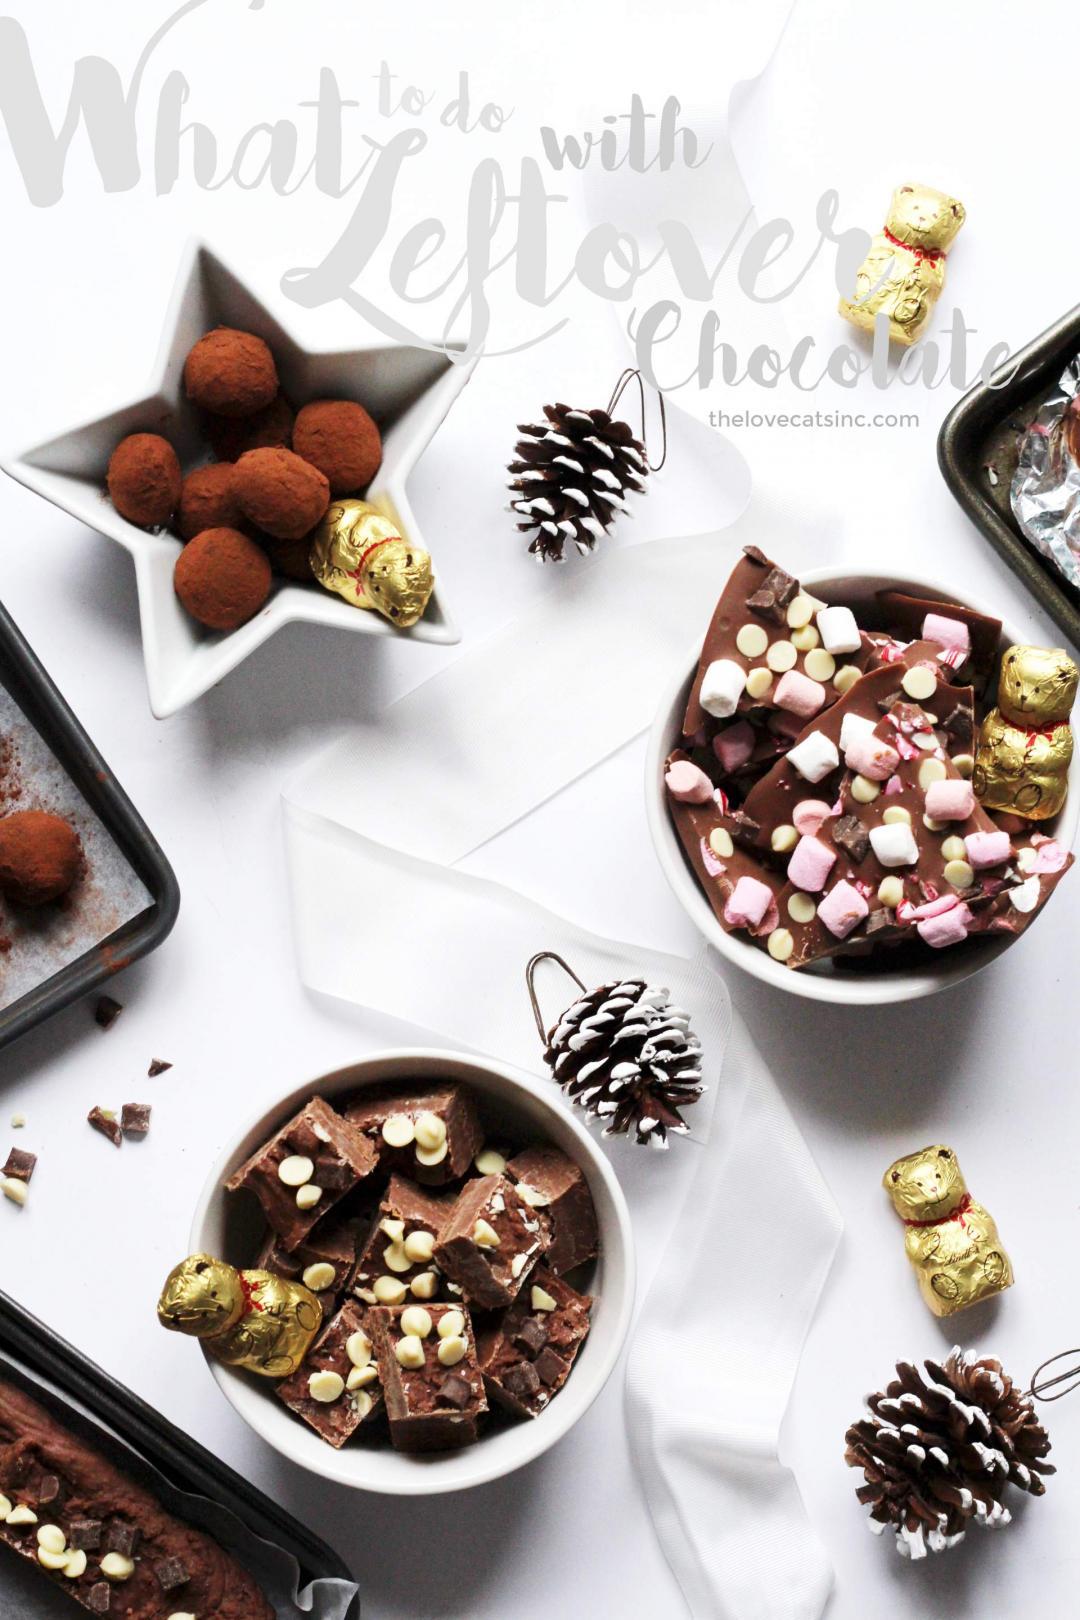 lindt-christmas-easy-recipe-chocolate-truffles-chocolate-chip-fudge-and-marshmallow-bark